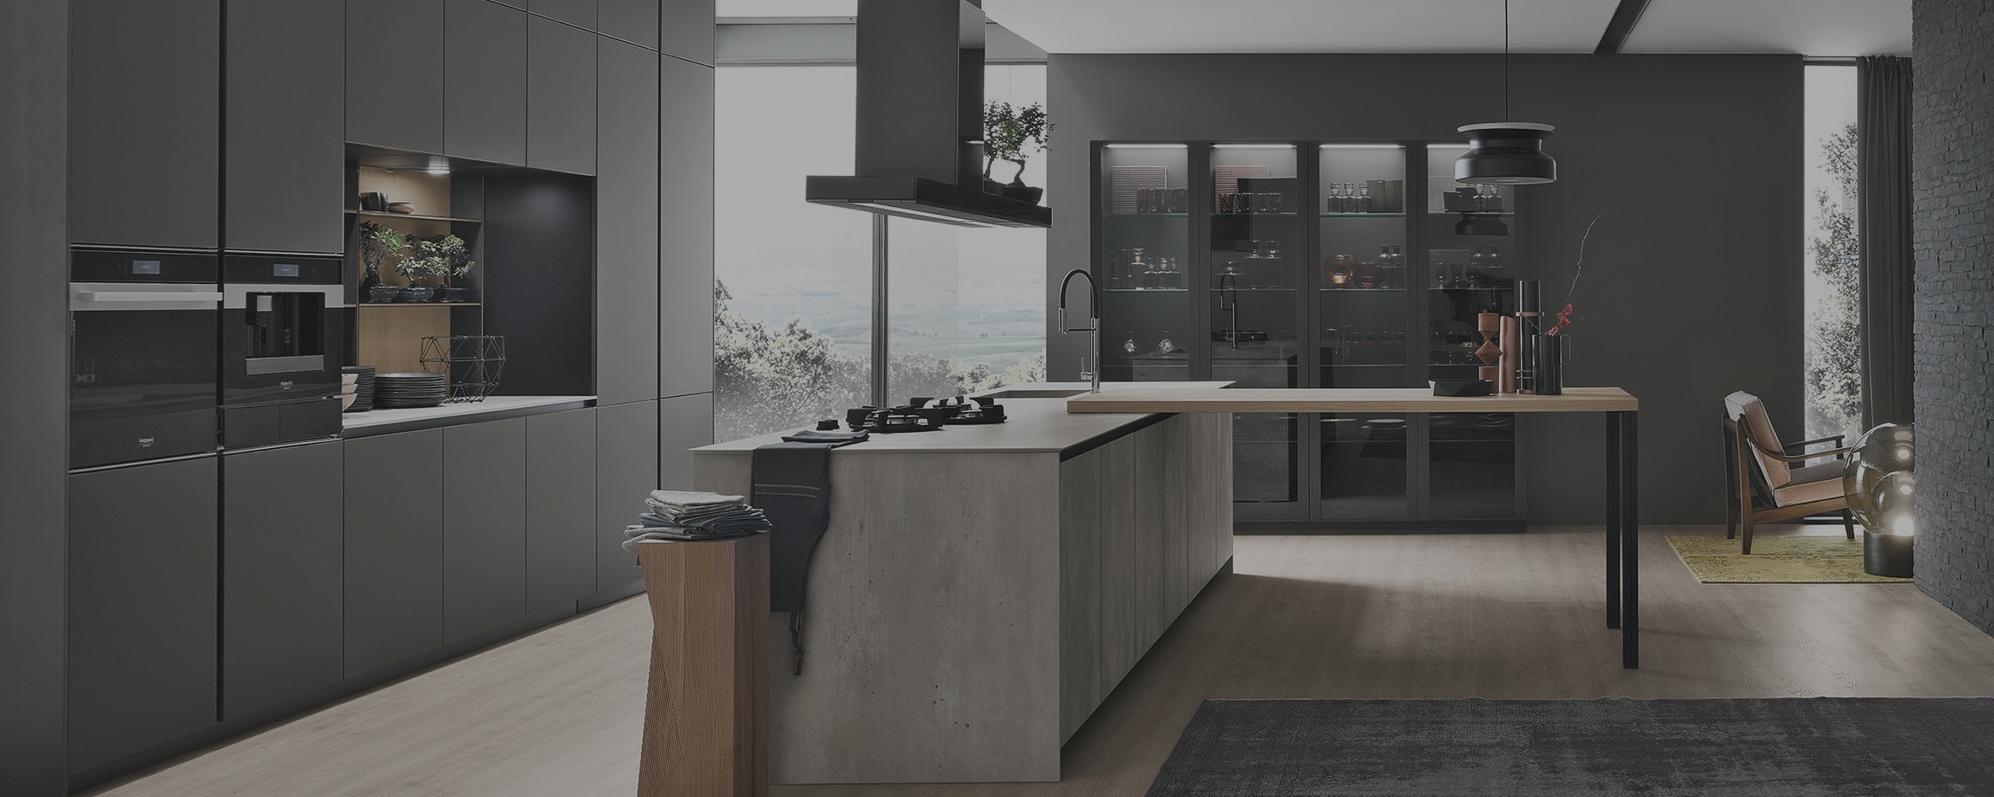 Home prowood stosa cucine milano - Stosa cucine milano ...